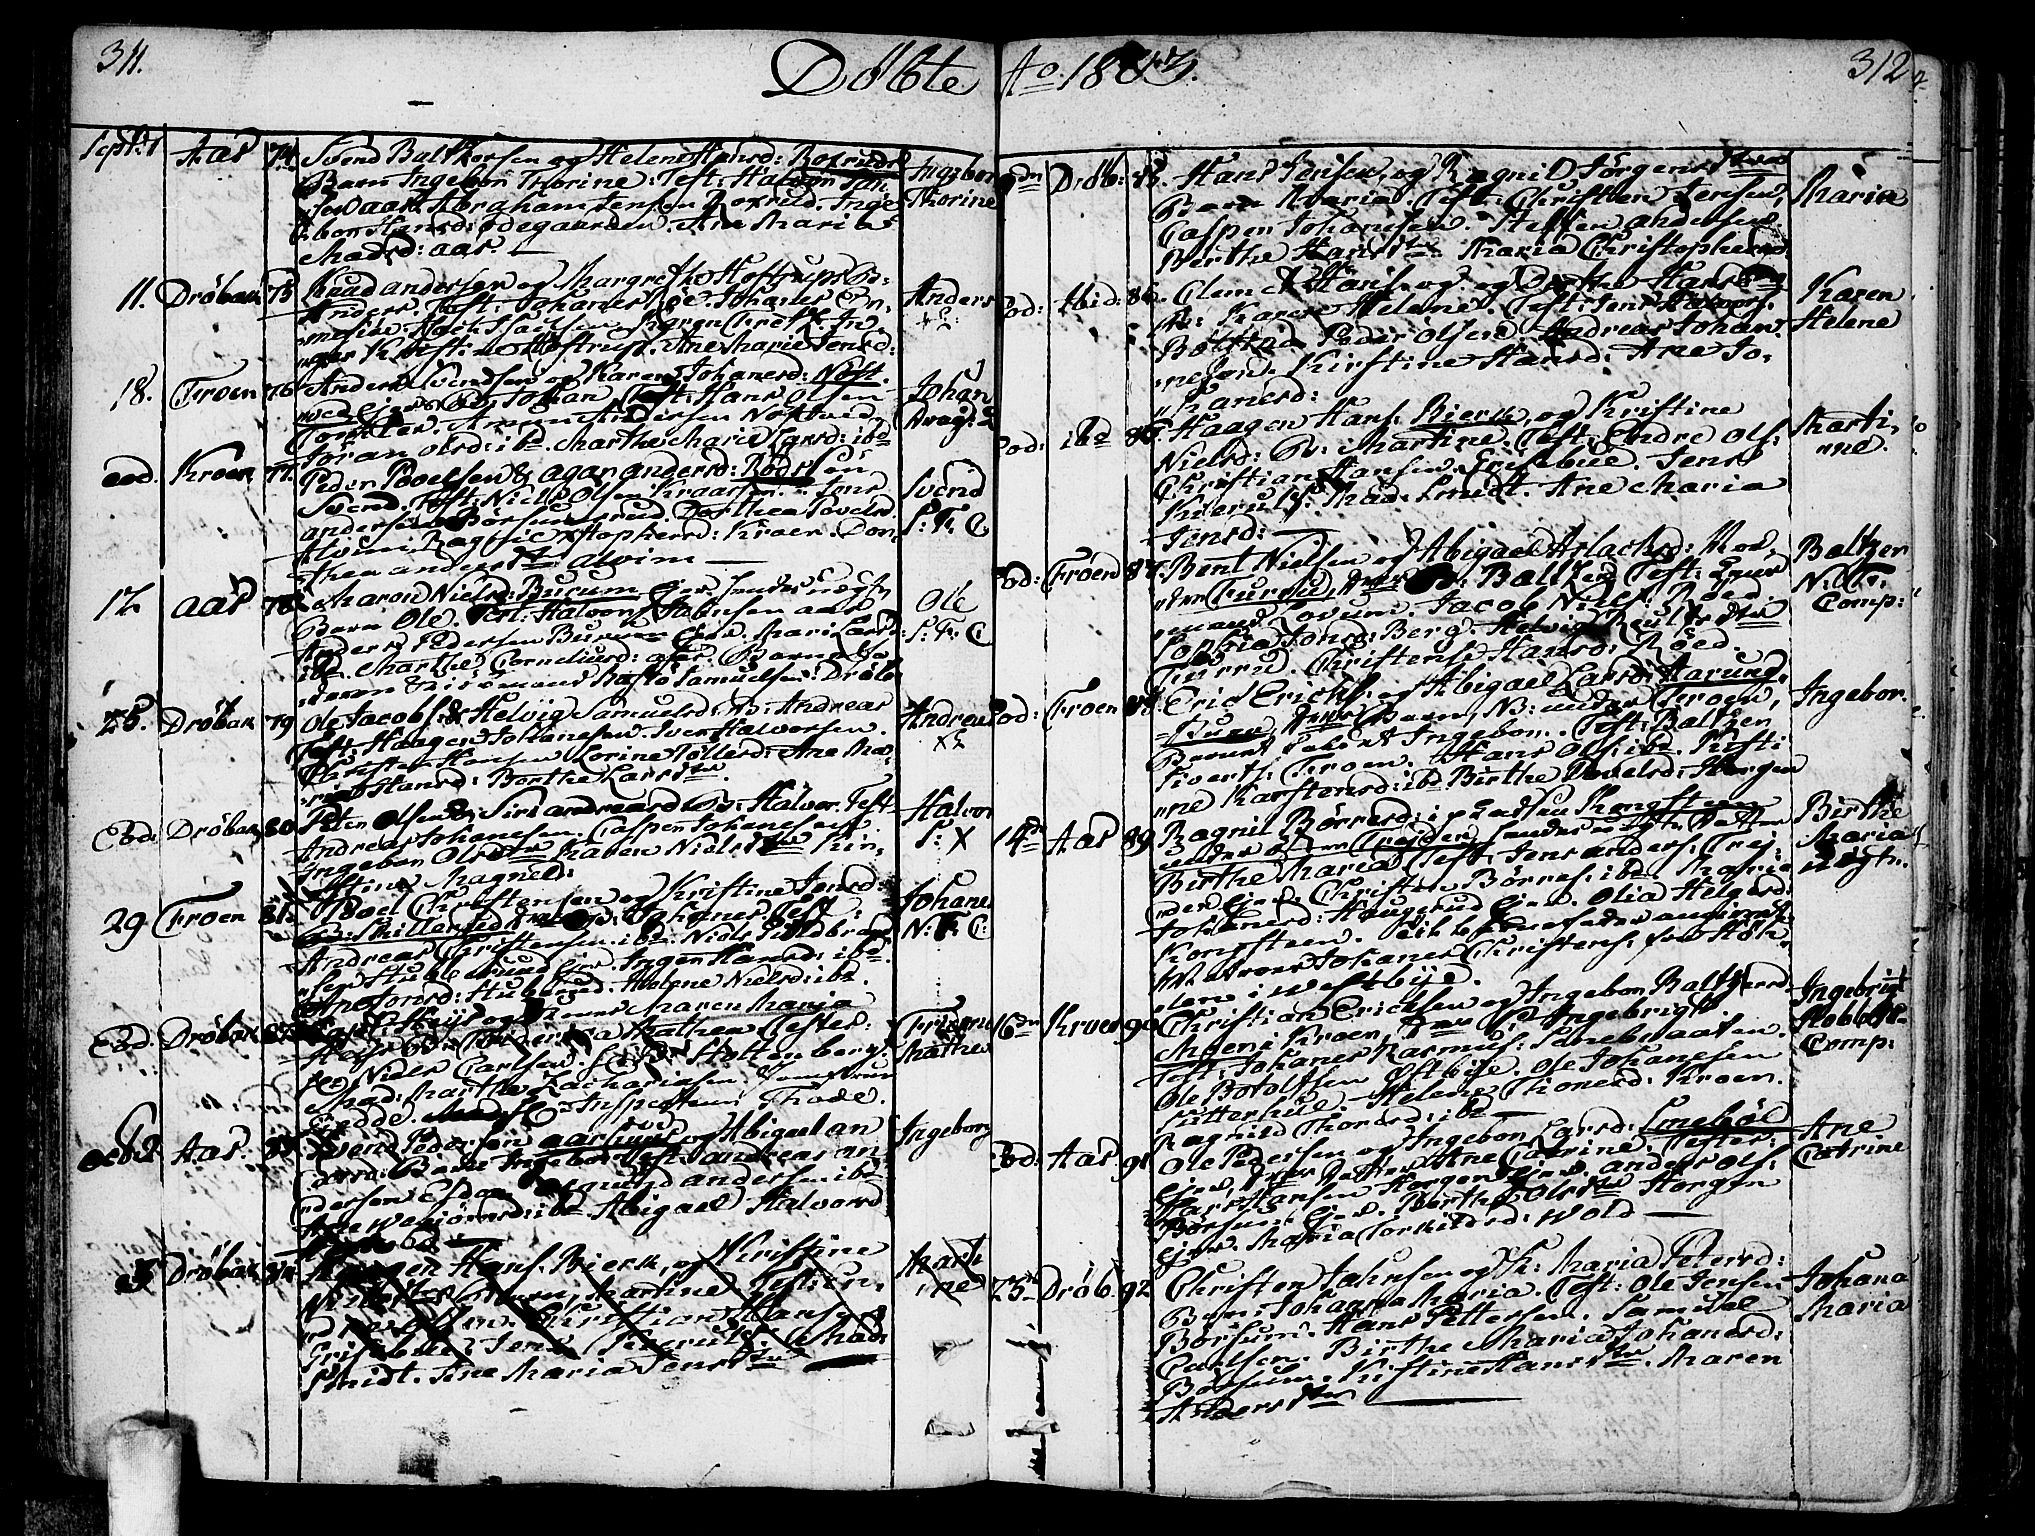 SAO, Ås prestekontor Kirkebøker, F/Fa/L0002: Ministerialbok nr. I 2, 1778-1813, s. 311-312